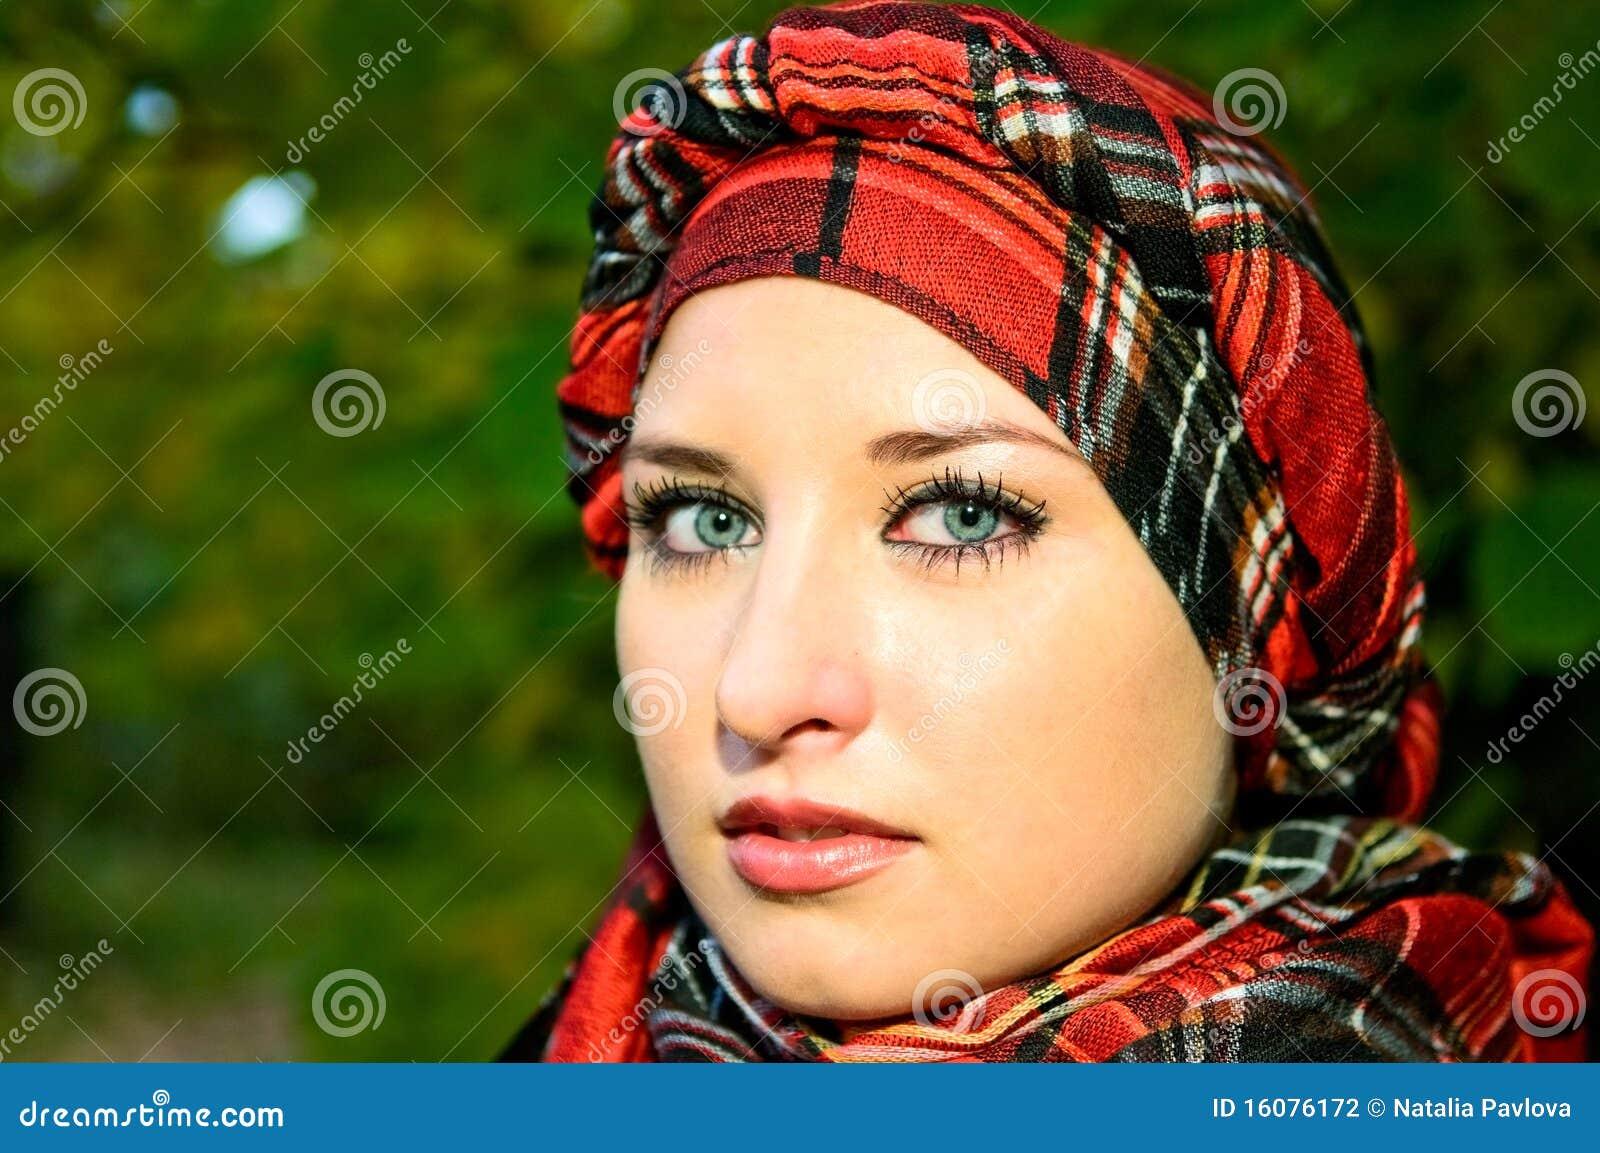 Pretty Girl In Headscarf Stock Photo. Image Of Model